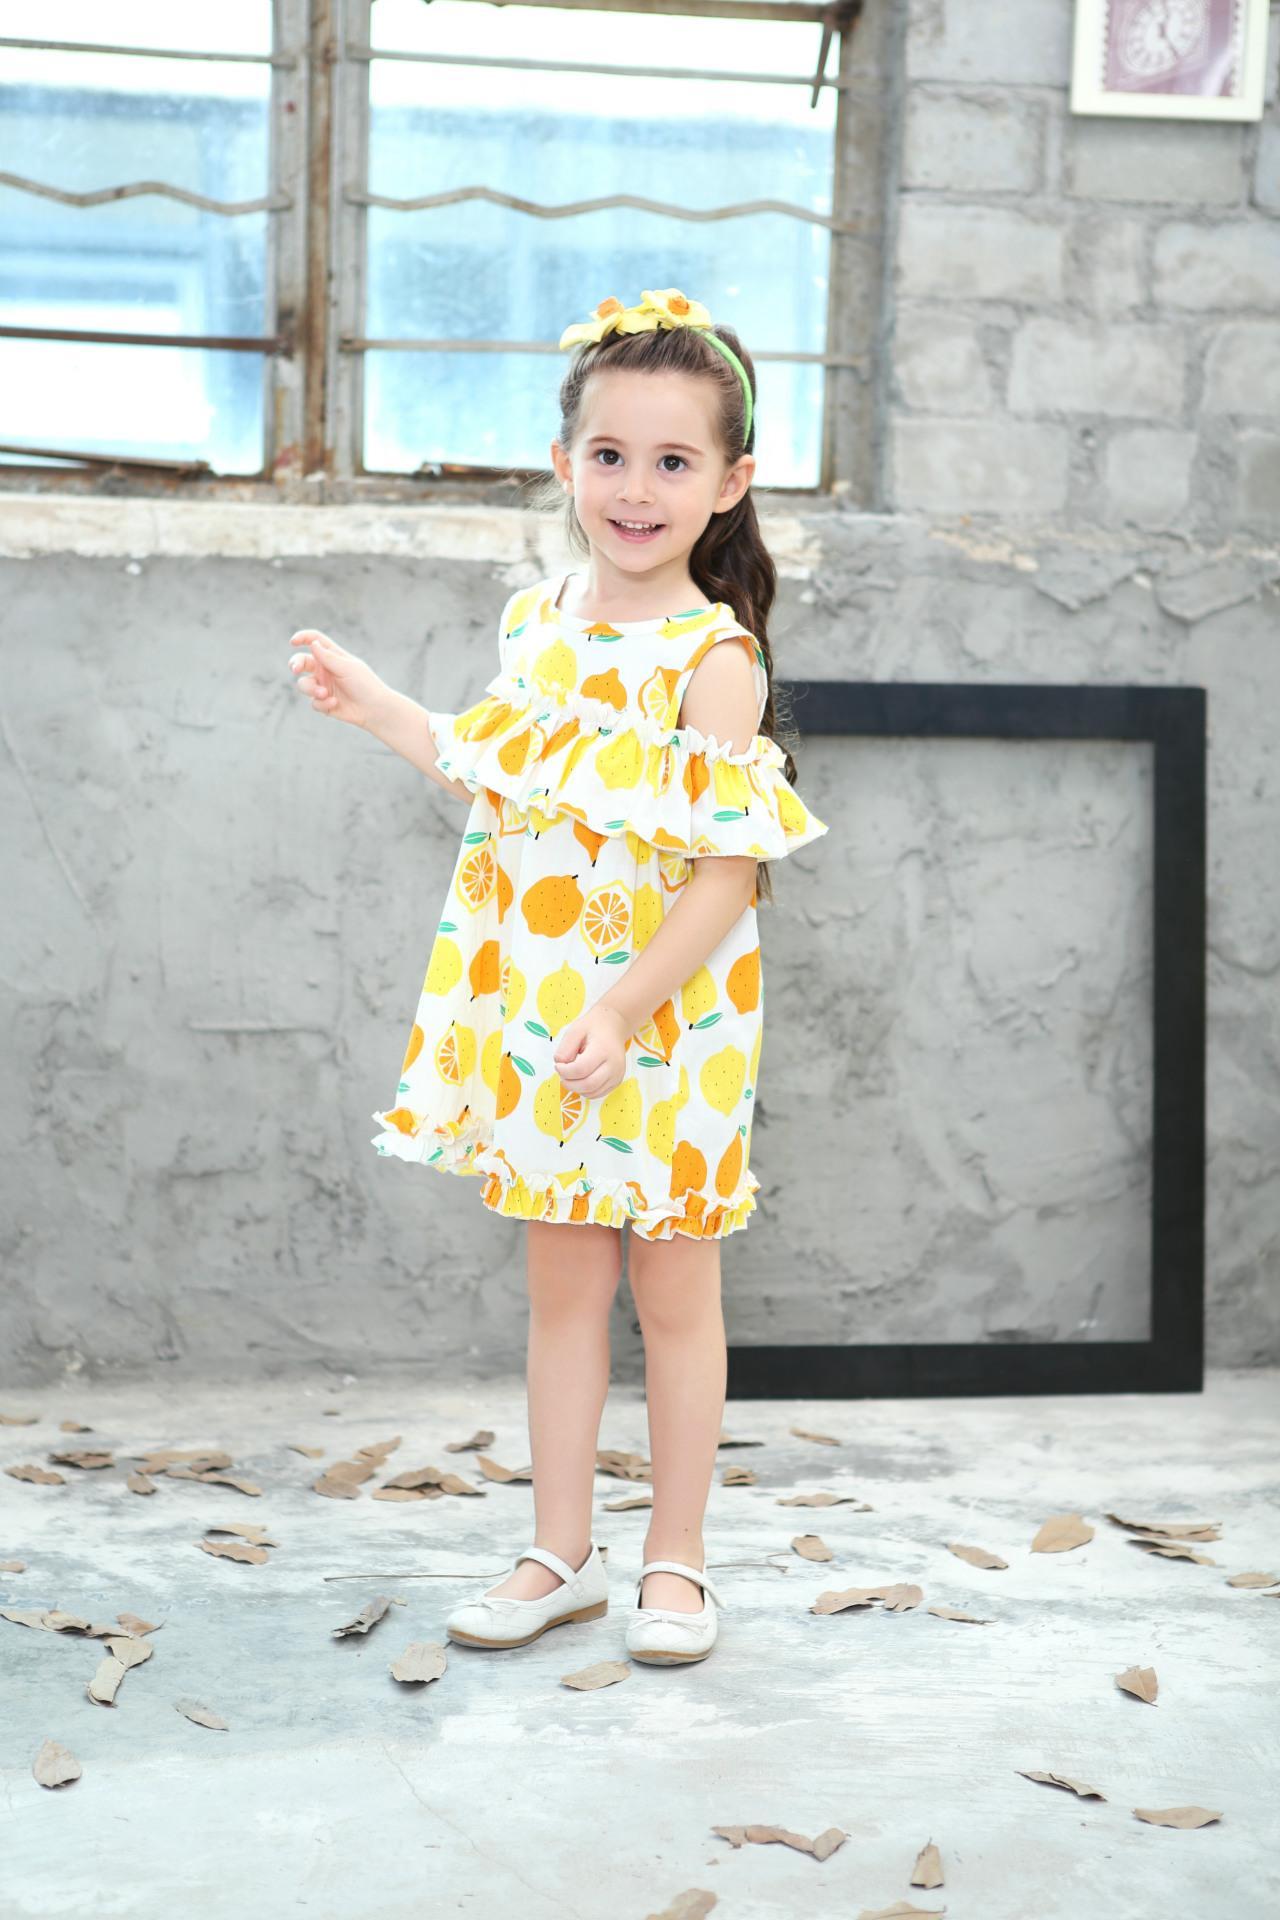 Lemon Printd Girls Dress 2018 New Summer Fashion Children Princess Dress Kids Children Clothes For 2 3 4 5 6 7 8 Years 6